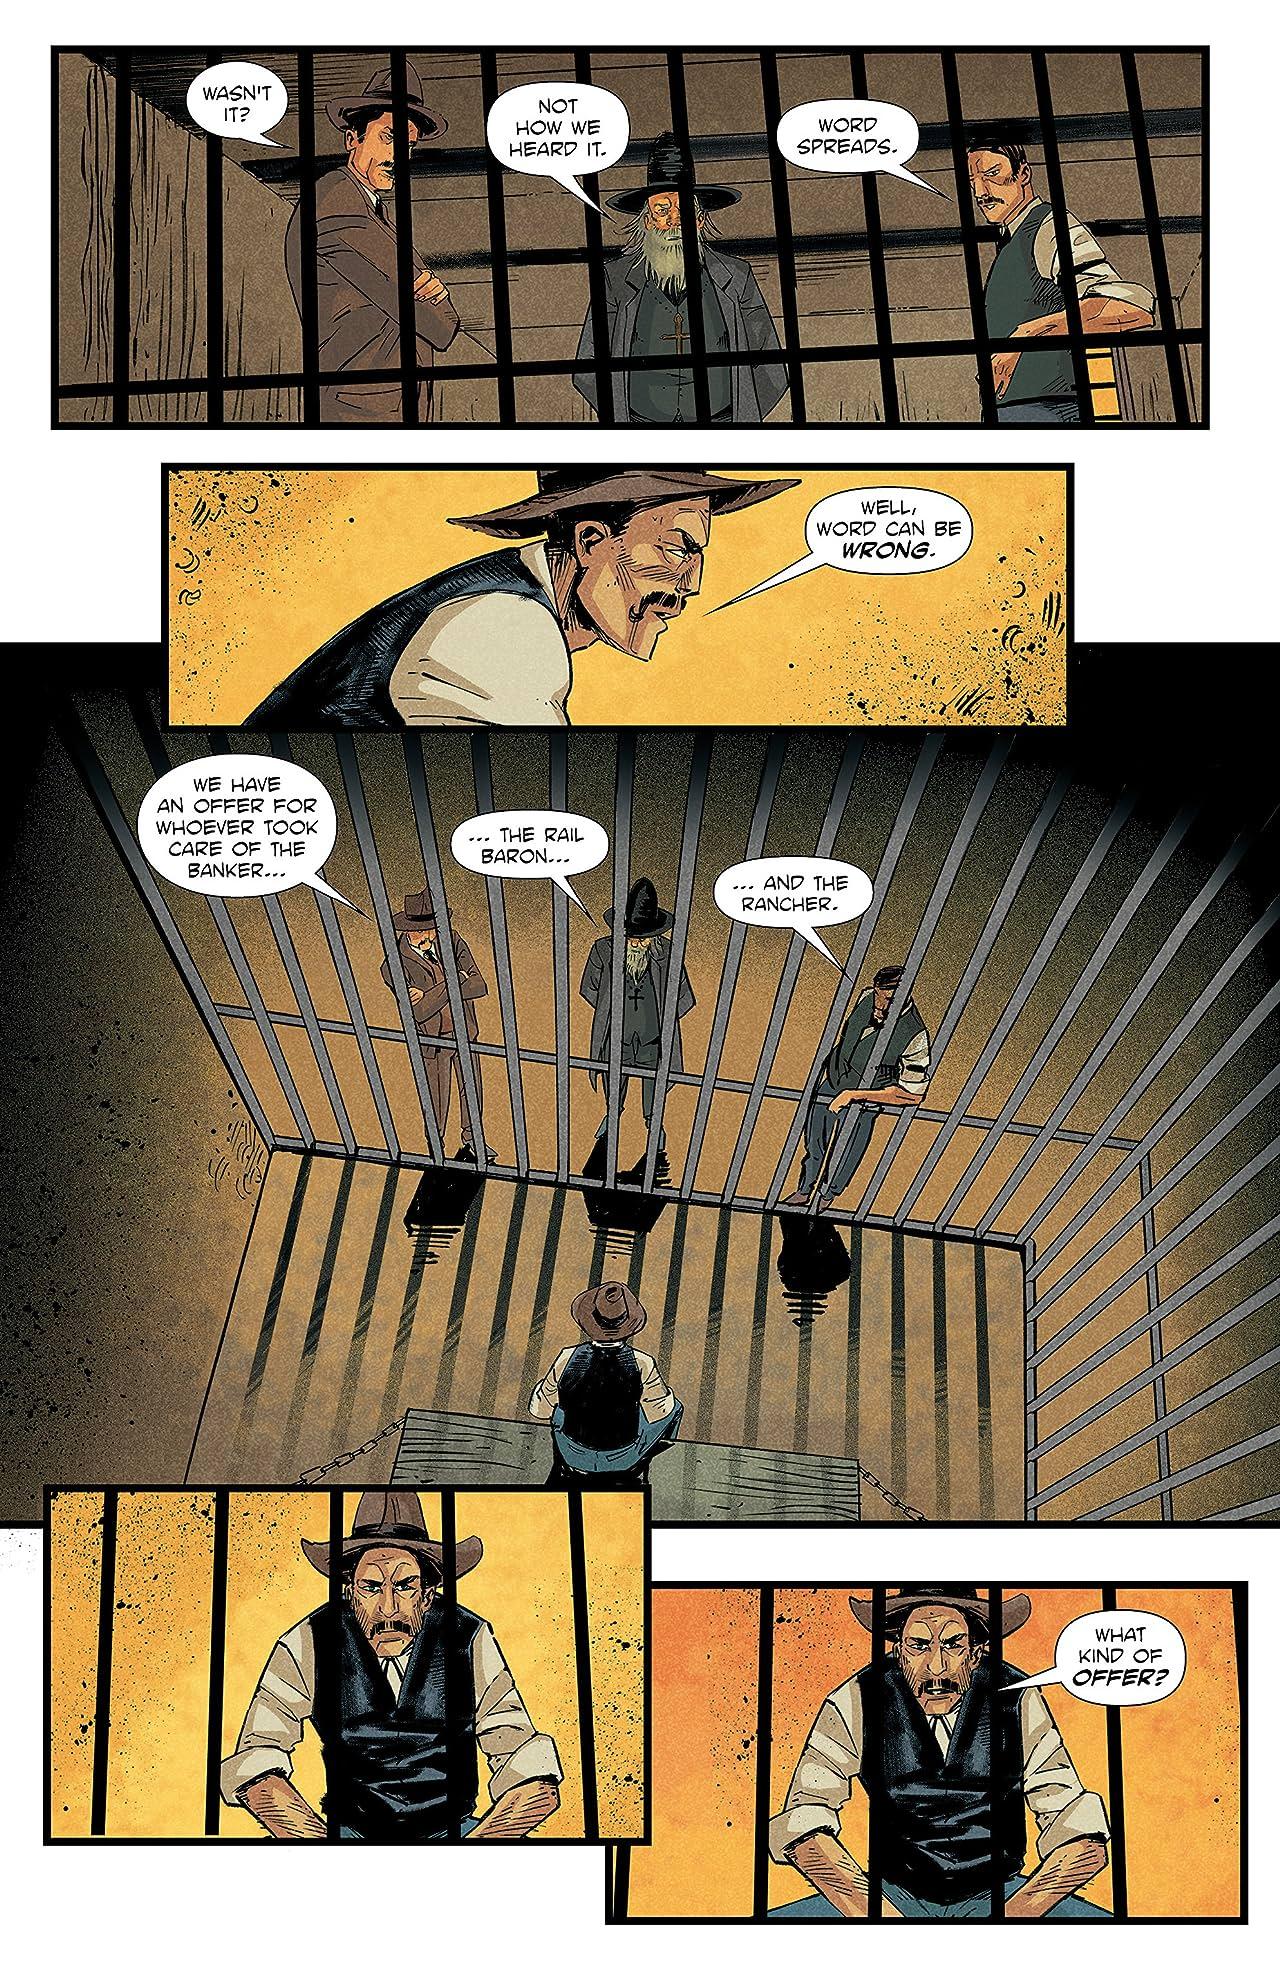 Black Jack Ketchum #2 (of 4)